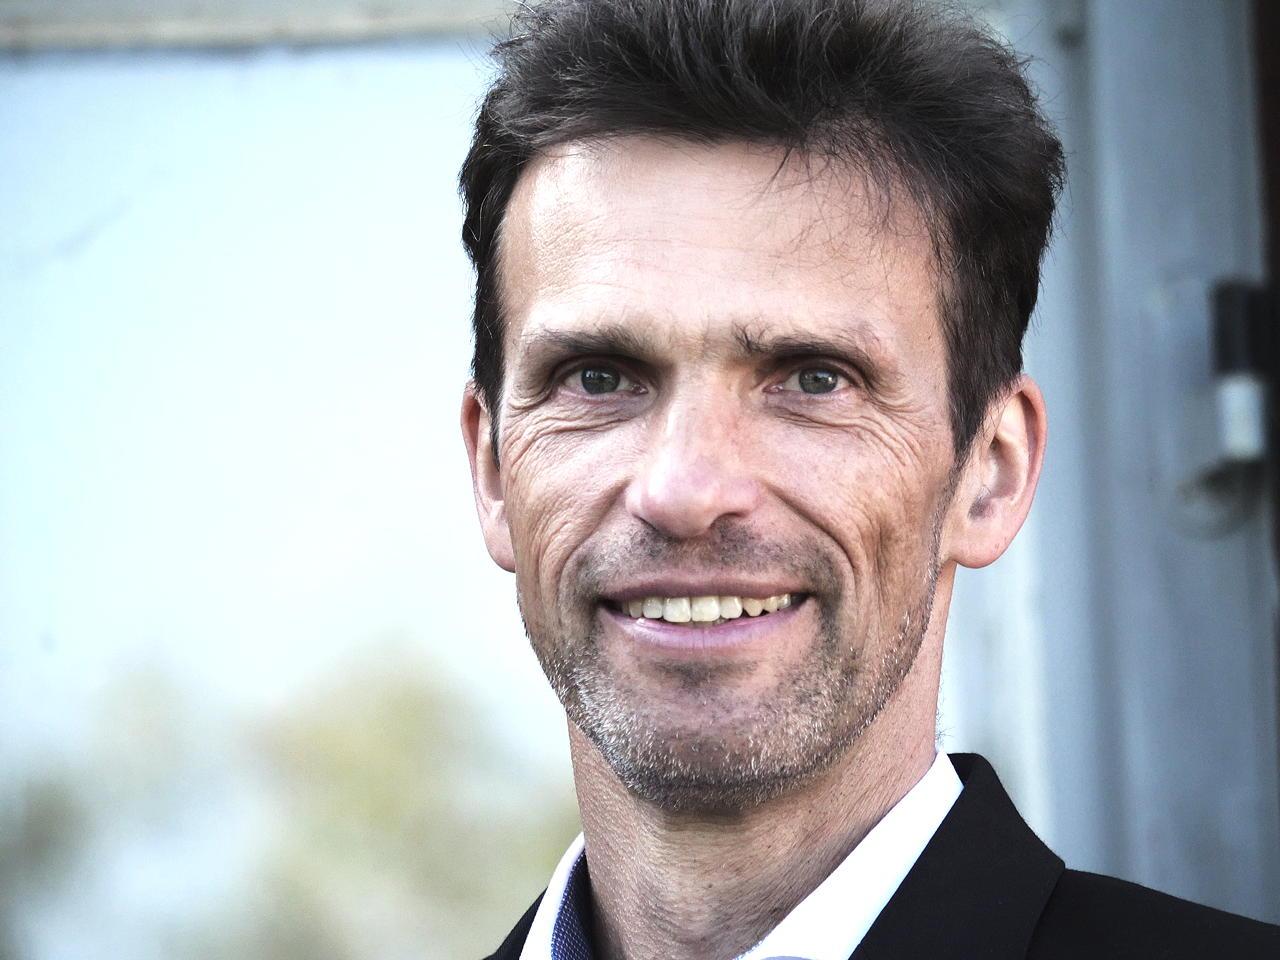 Dr. Thomas Wels